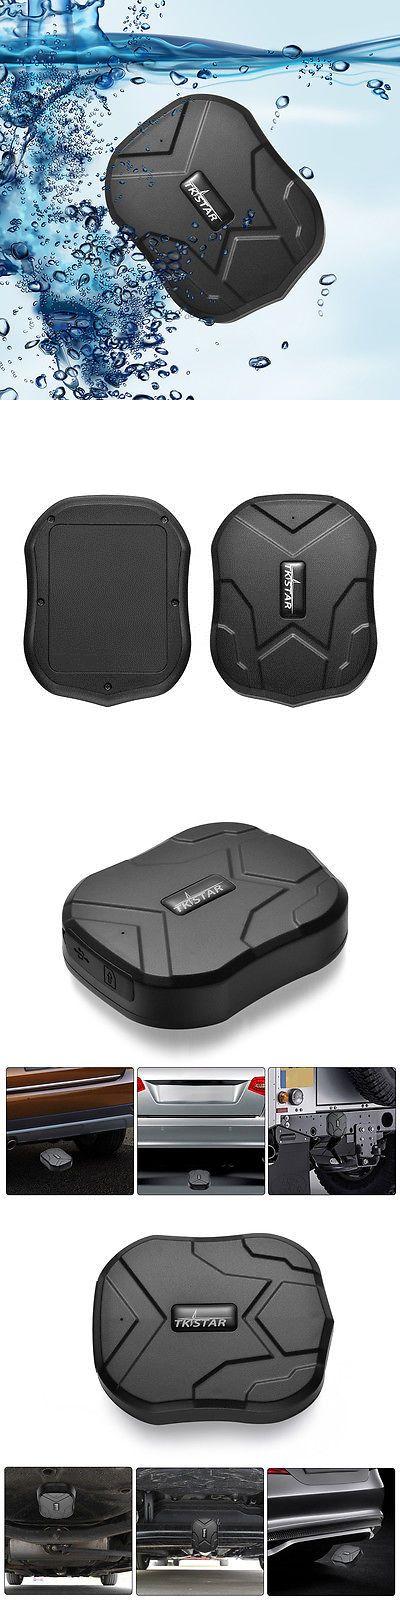 tracking devices tkstar mini sos alarm gps tracker locator for kids elders cars waterproof ps110